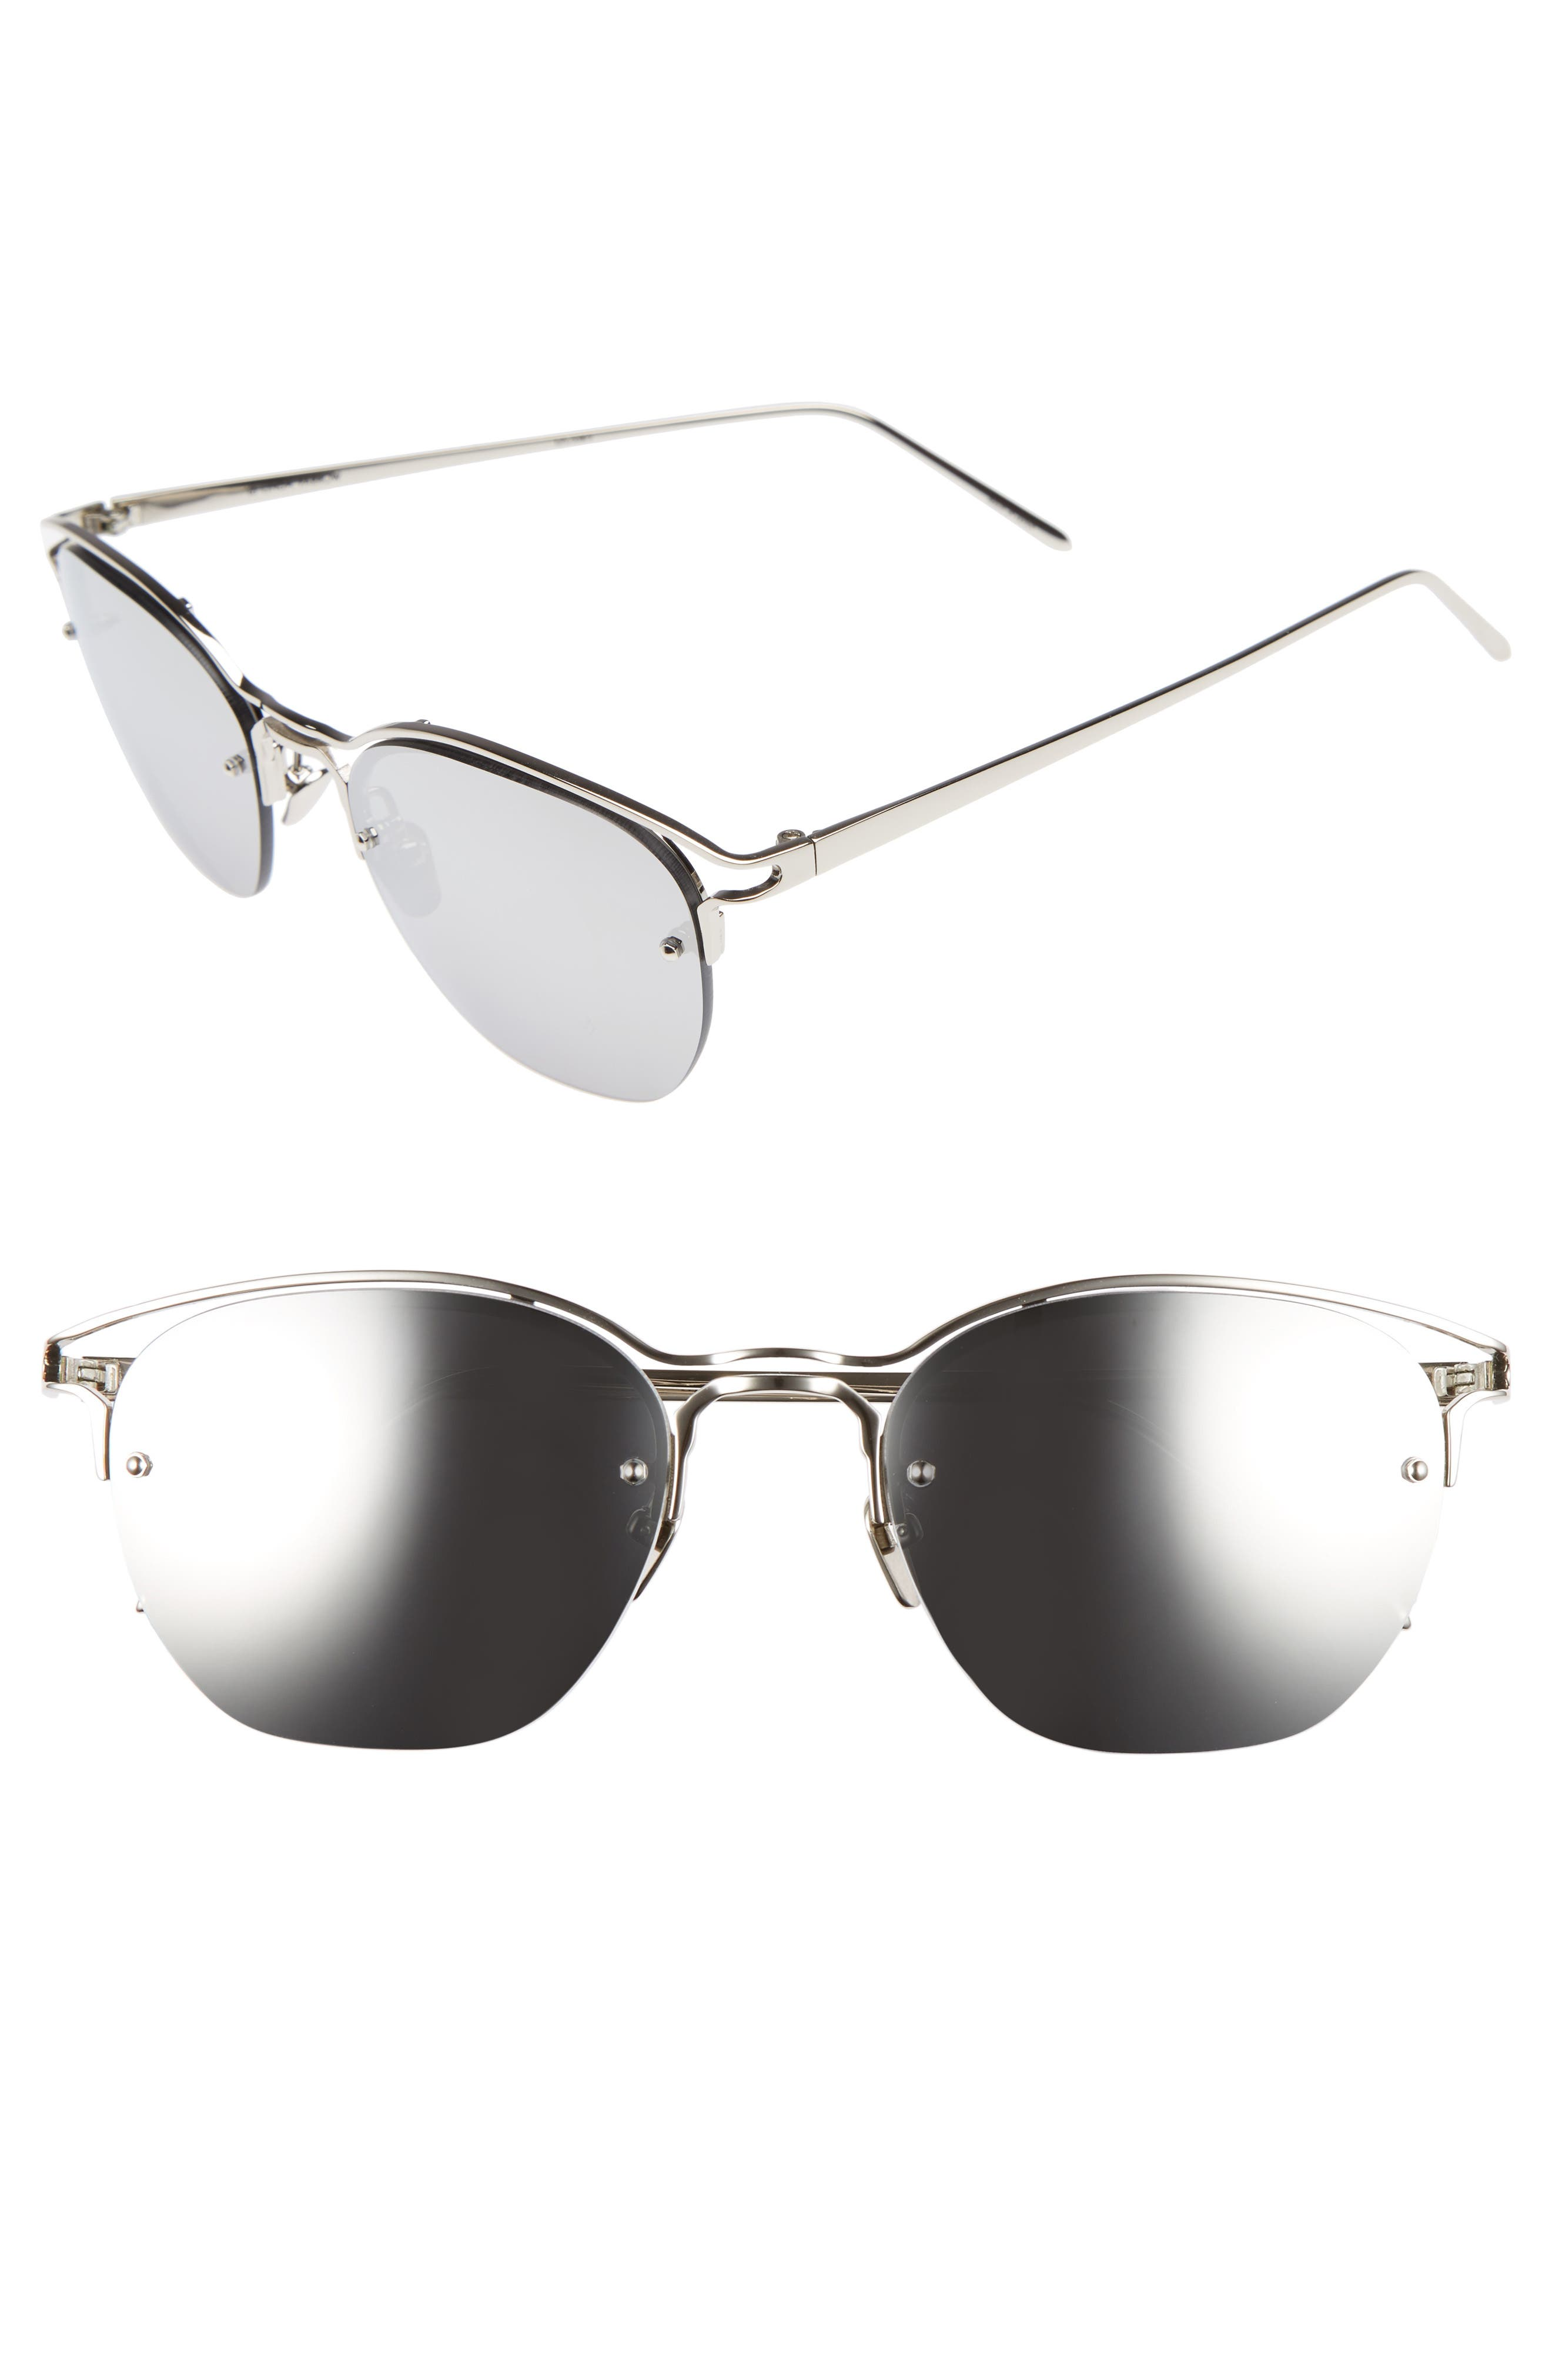 Main Image - Linda Farrow 55mm Round Sunglasses